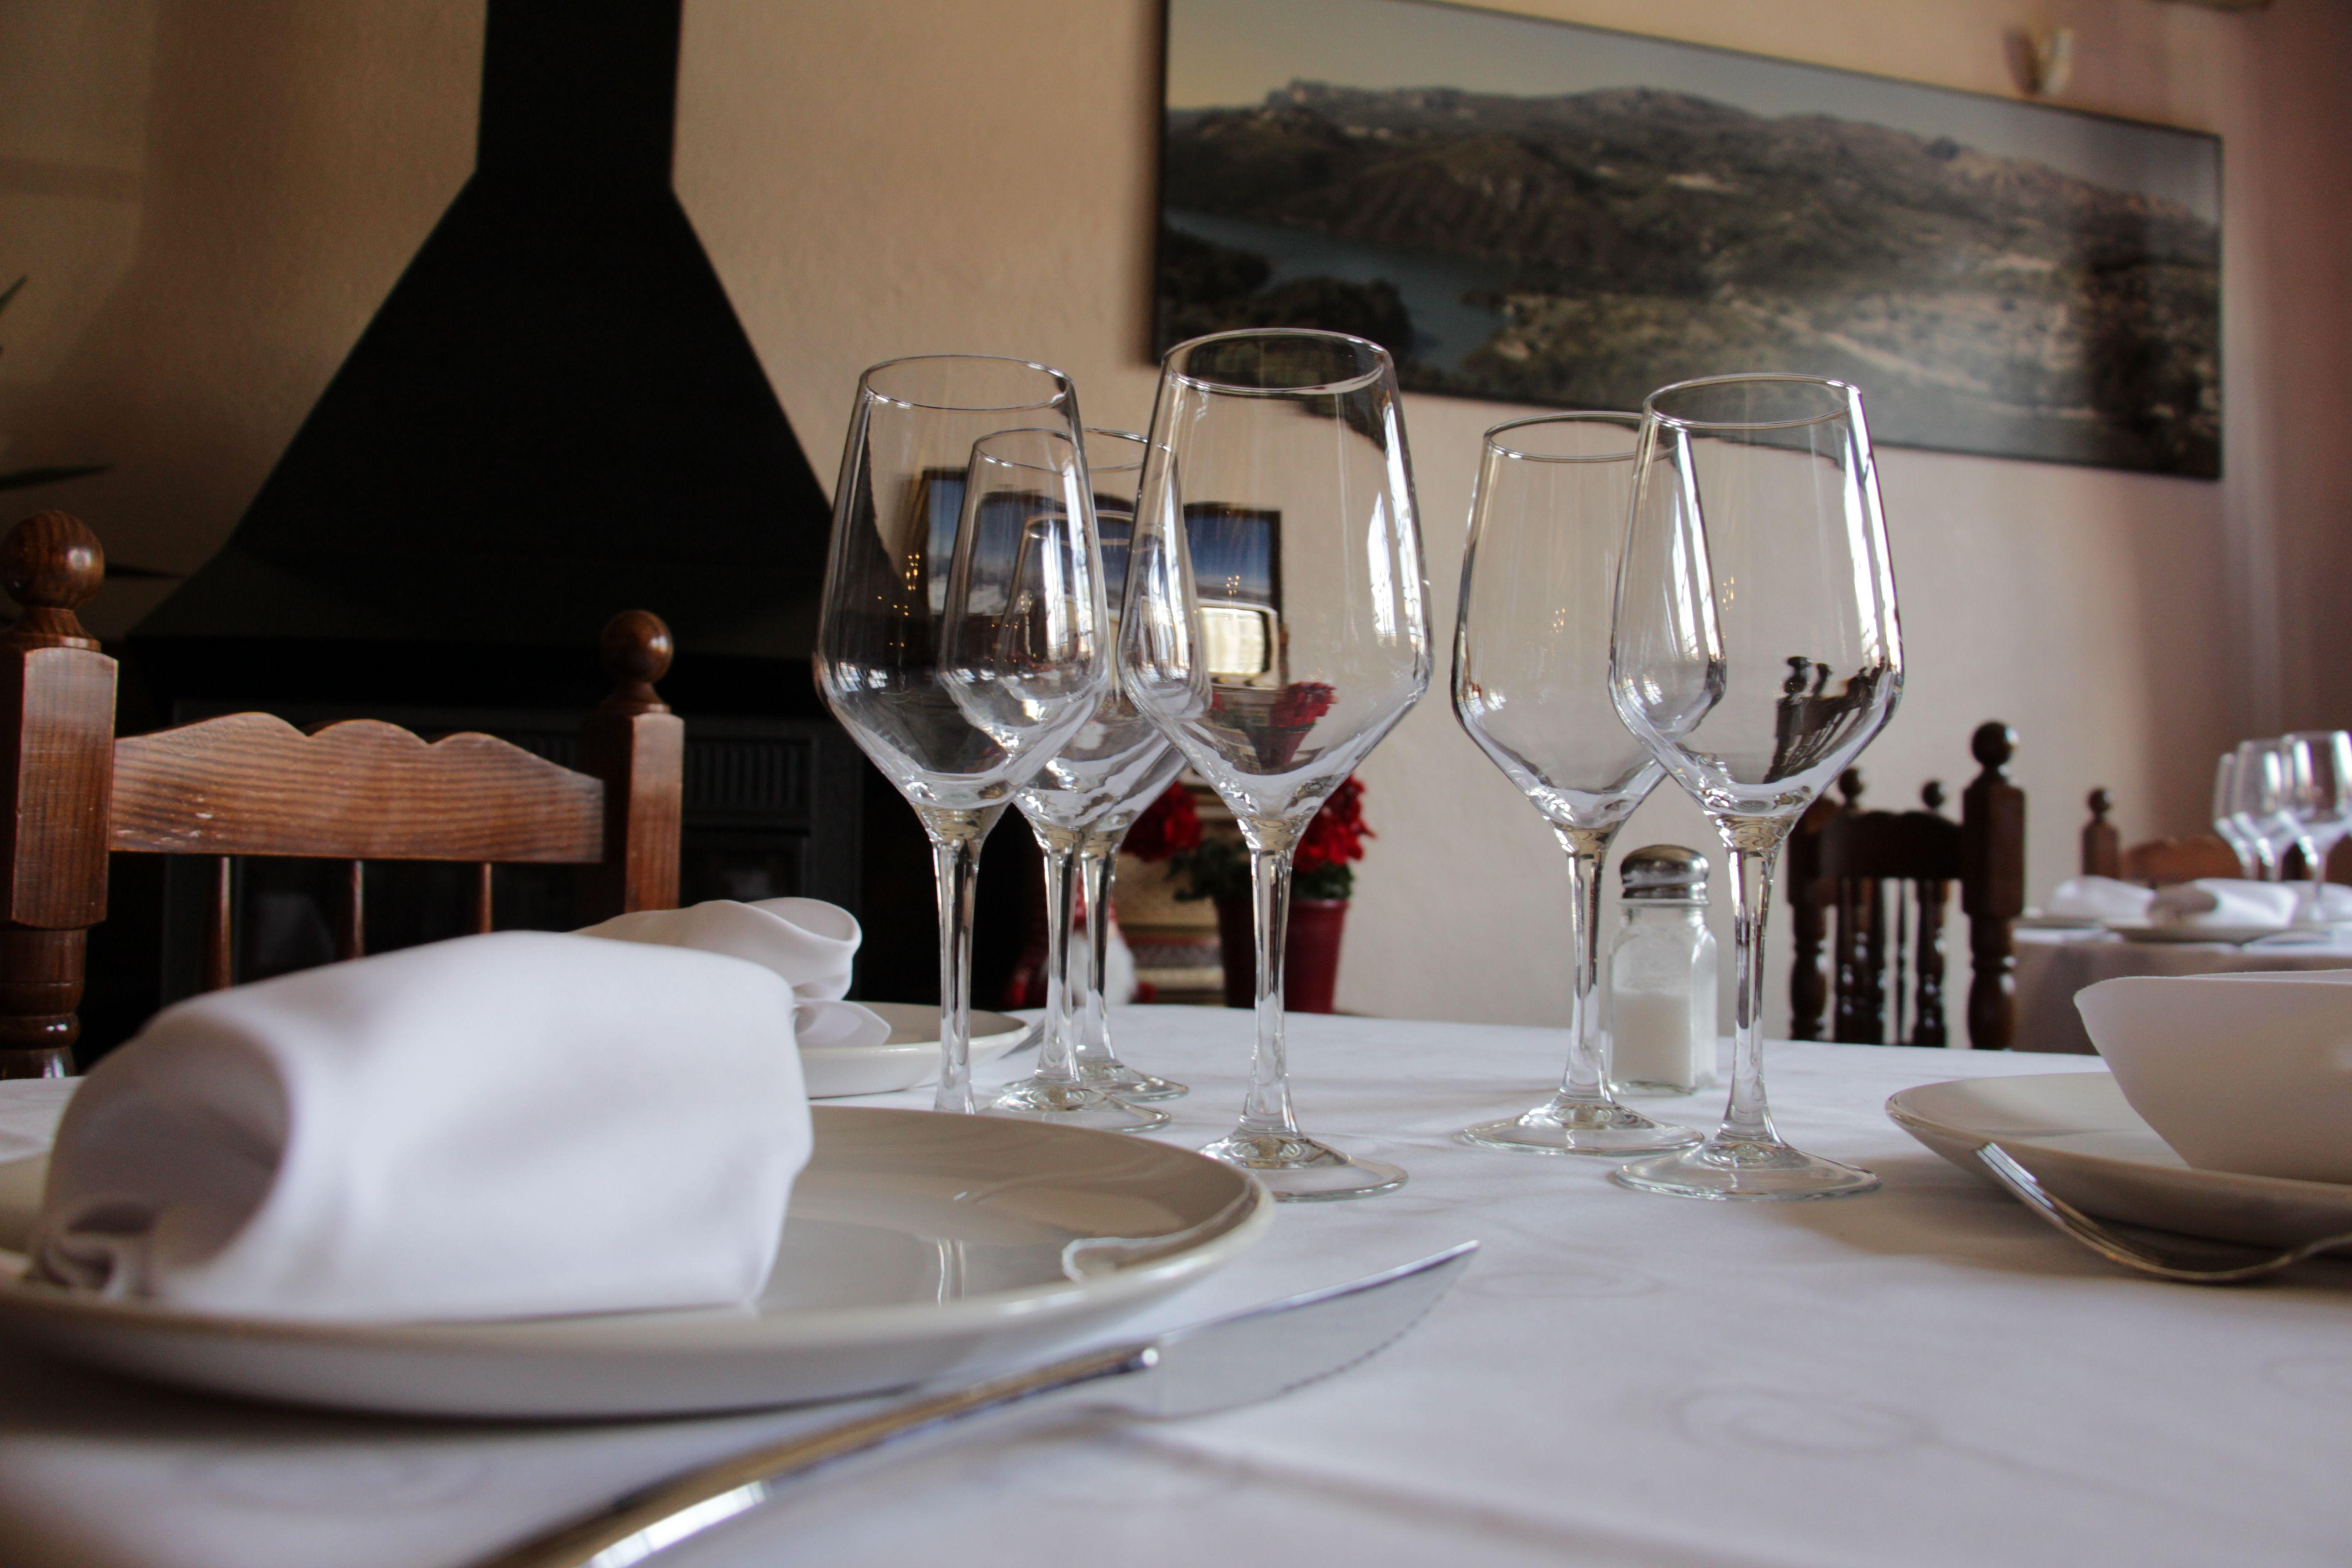 Foto 15 de Mesón - restaurante en Benimantell | Mesón Ca Rafel